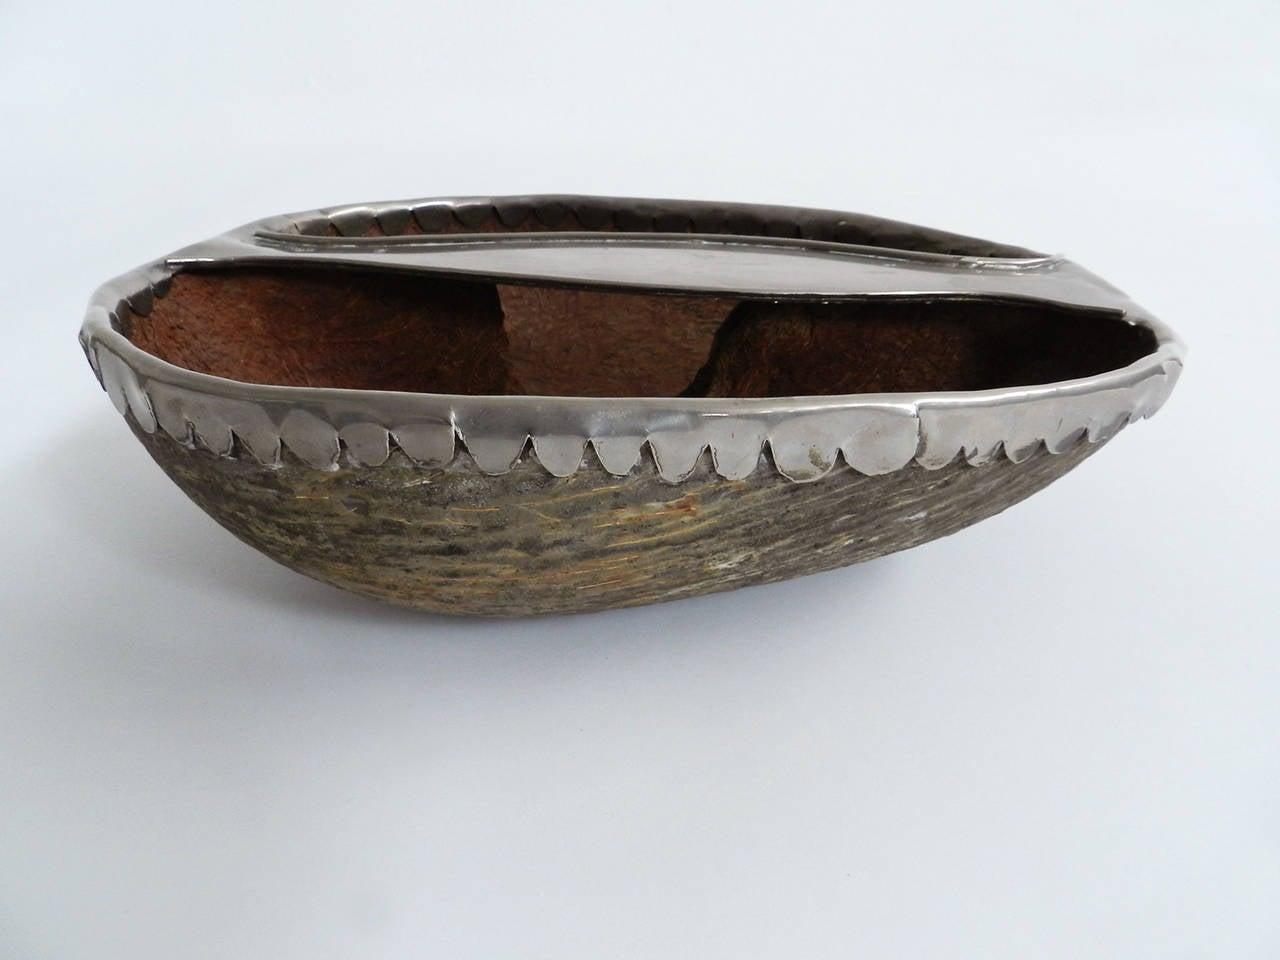 coconut bowls - photo #23